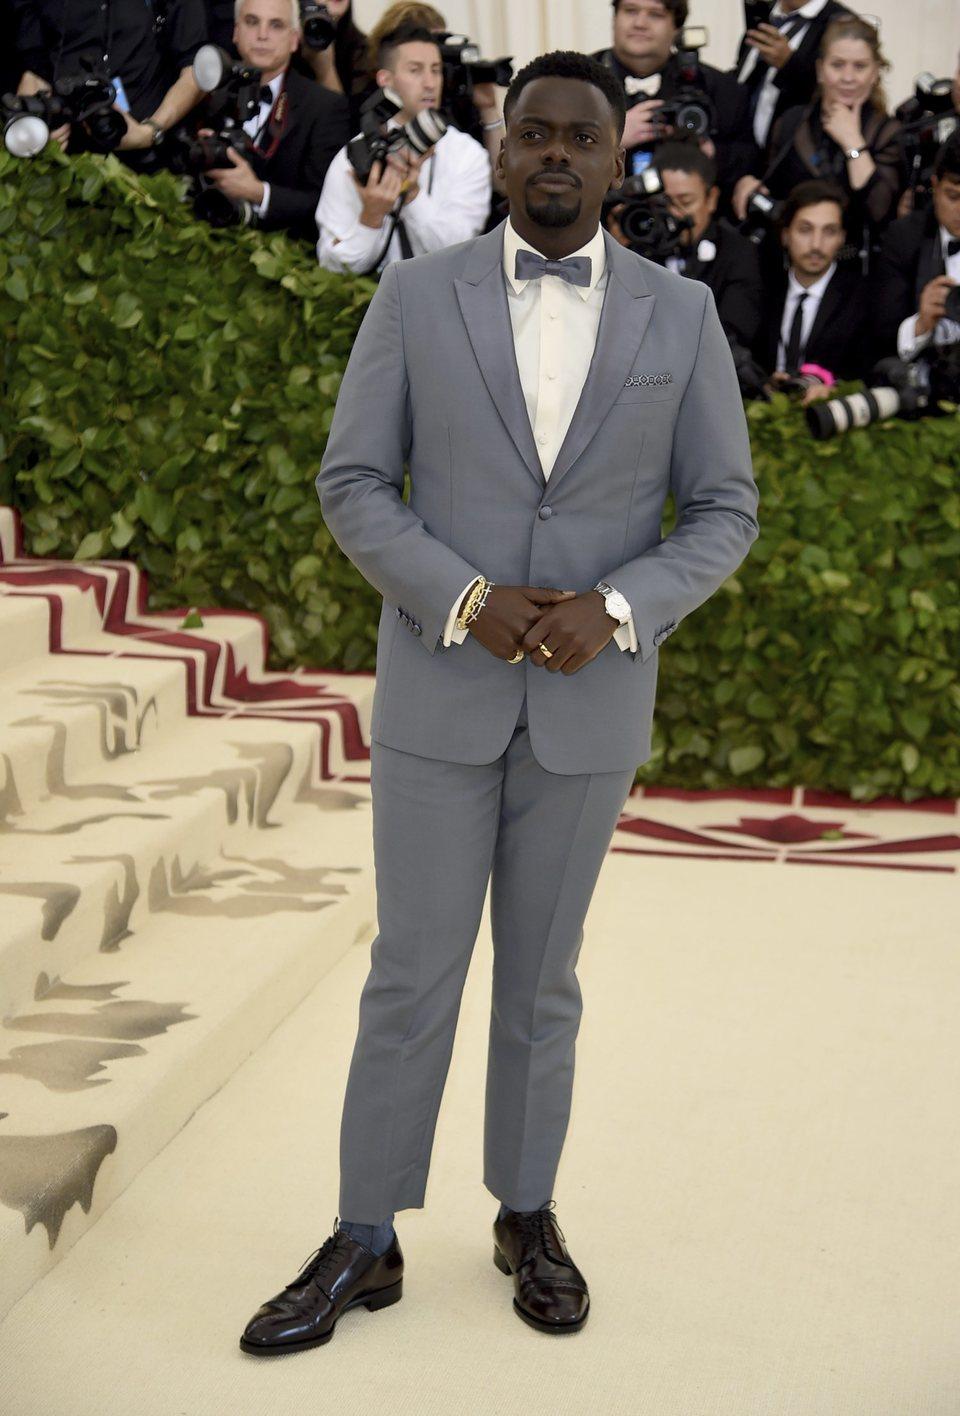 Daniel Kaluuya at the Met Gala 2018